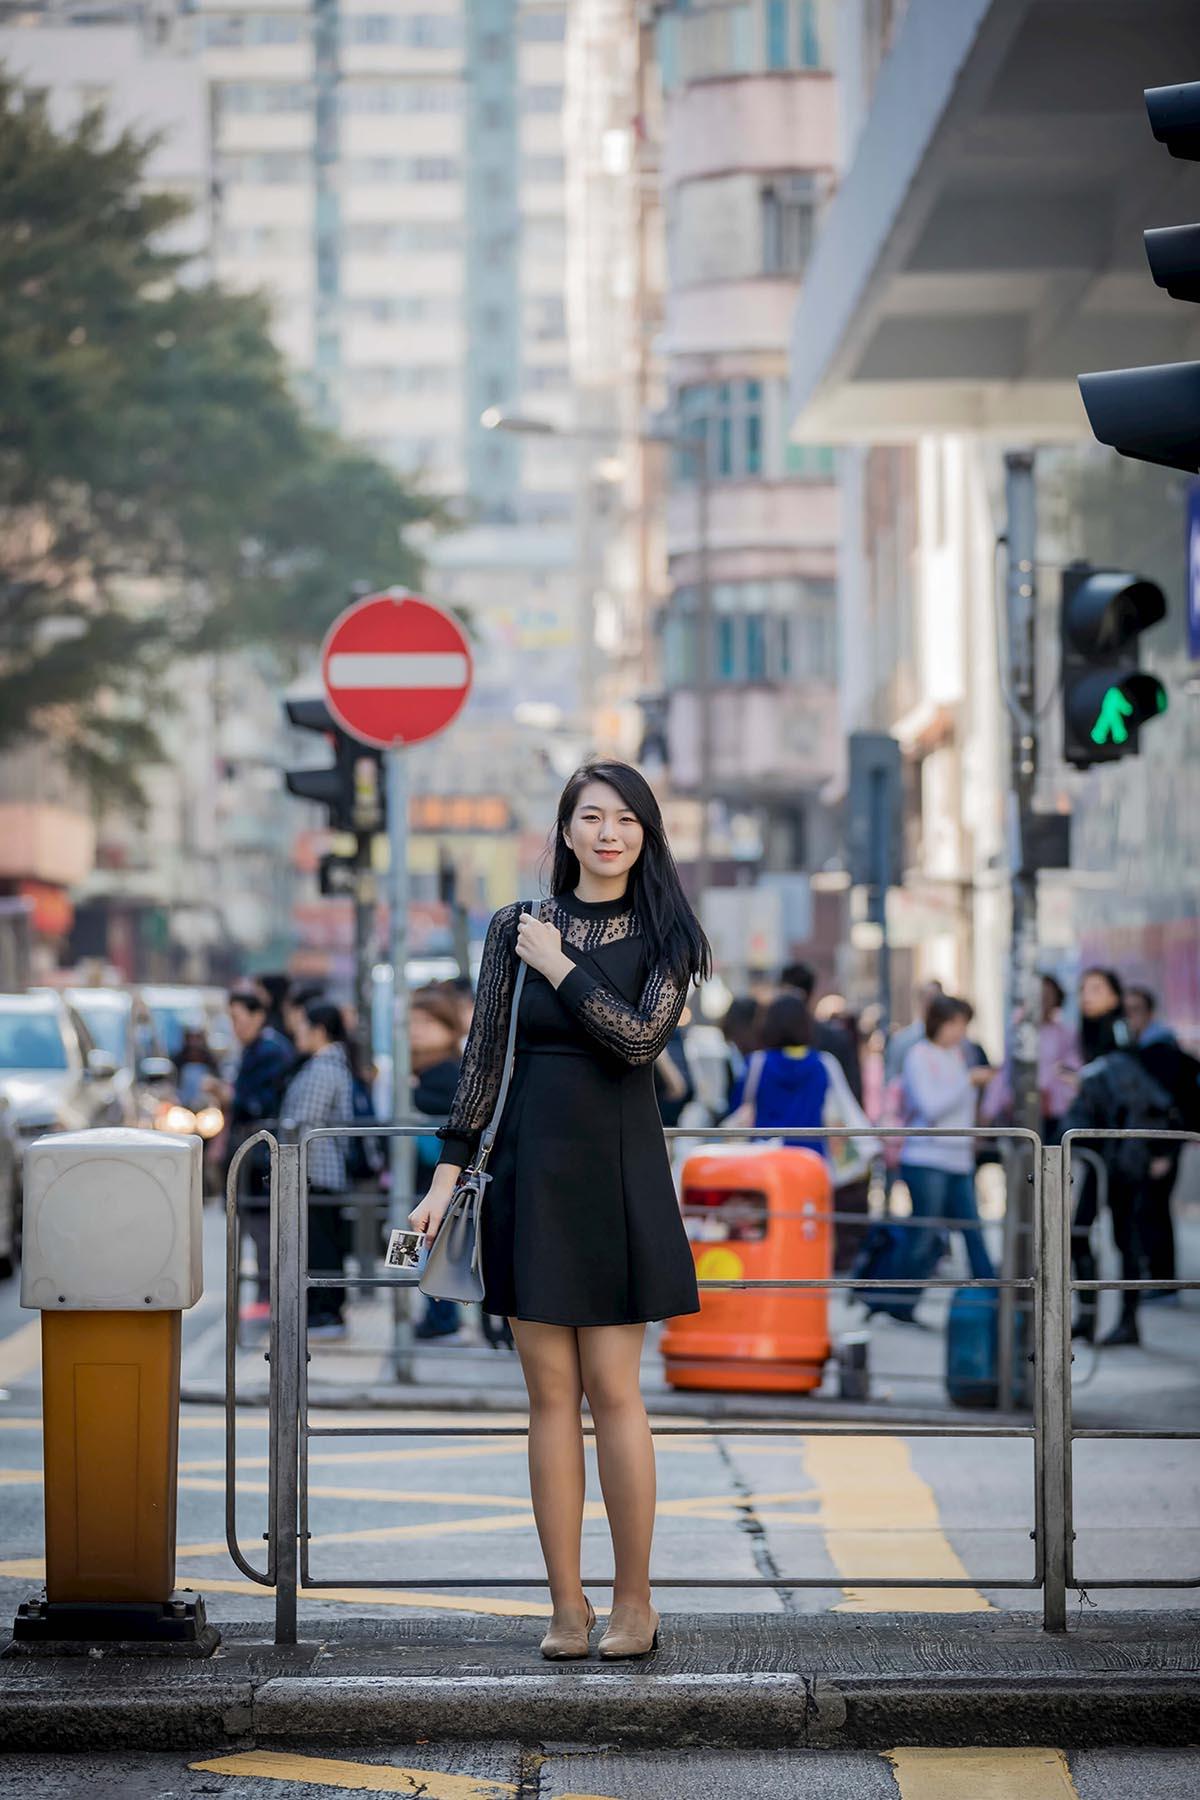 Sprazzi_Professional_Portrait_Photo_Hongkong_Kevin_Resize_23.jpg